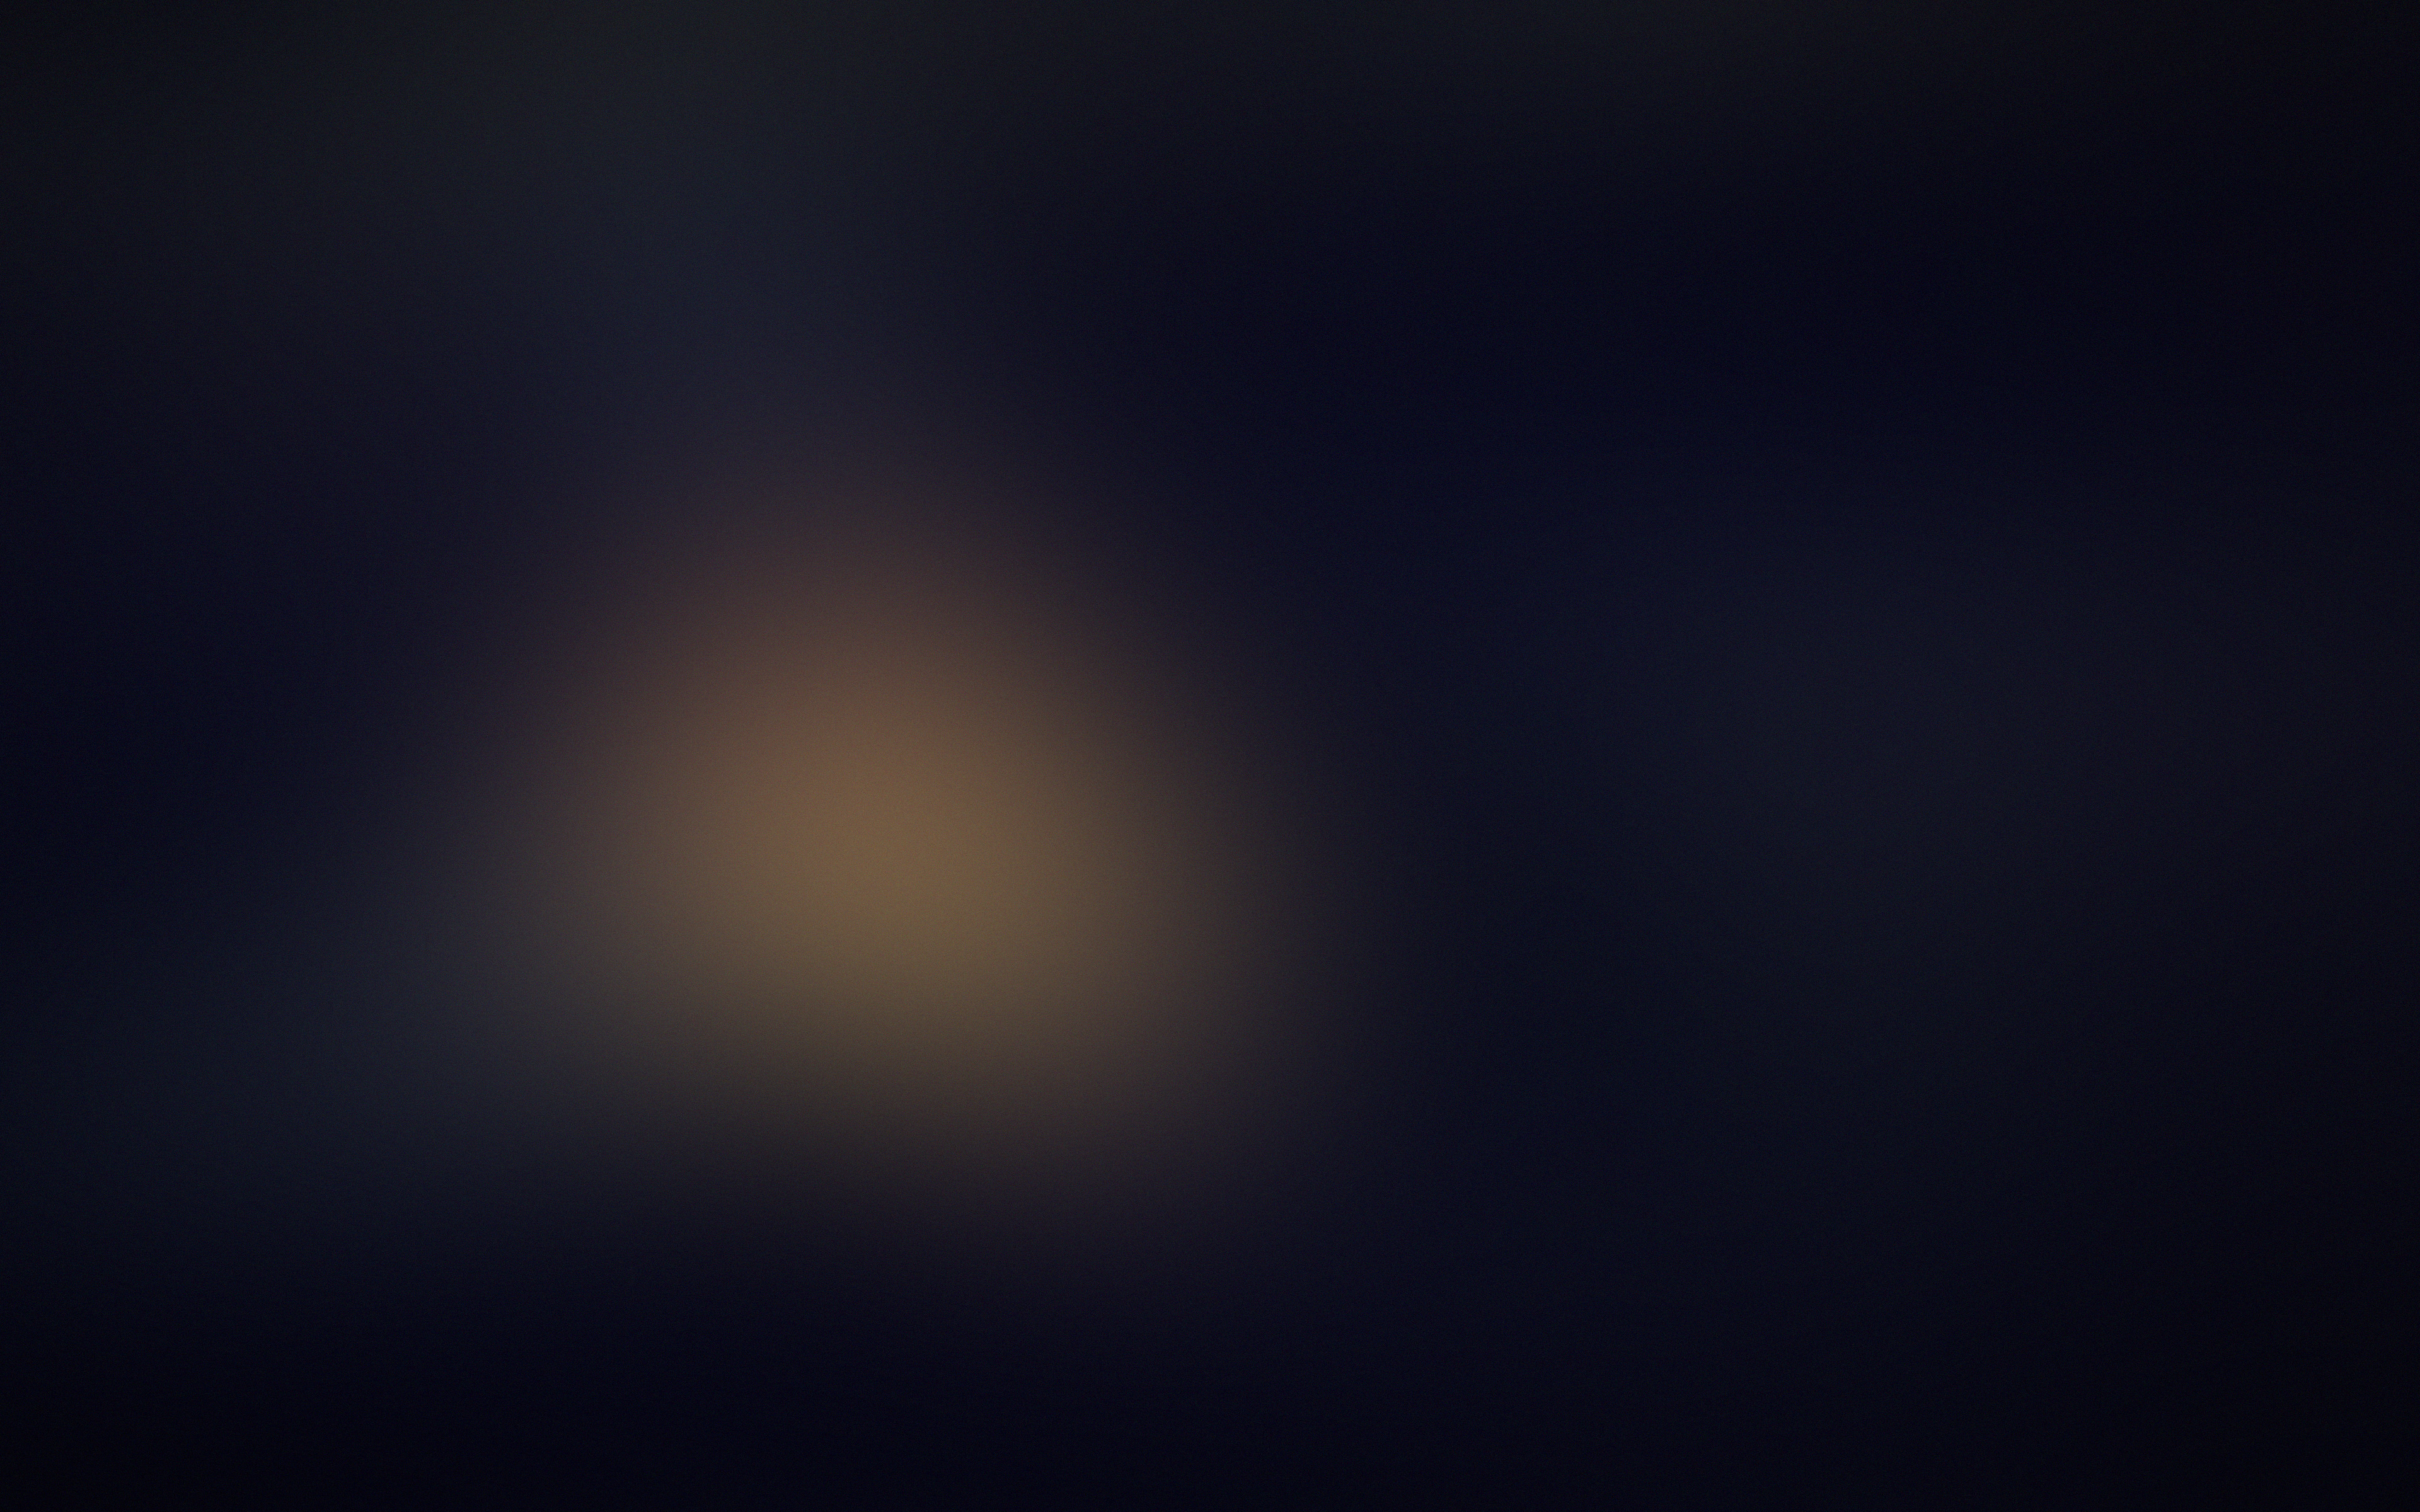 3840x2400 Dark Abstract Blur 4k 4k HD 4k Wallpapers ...